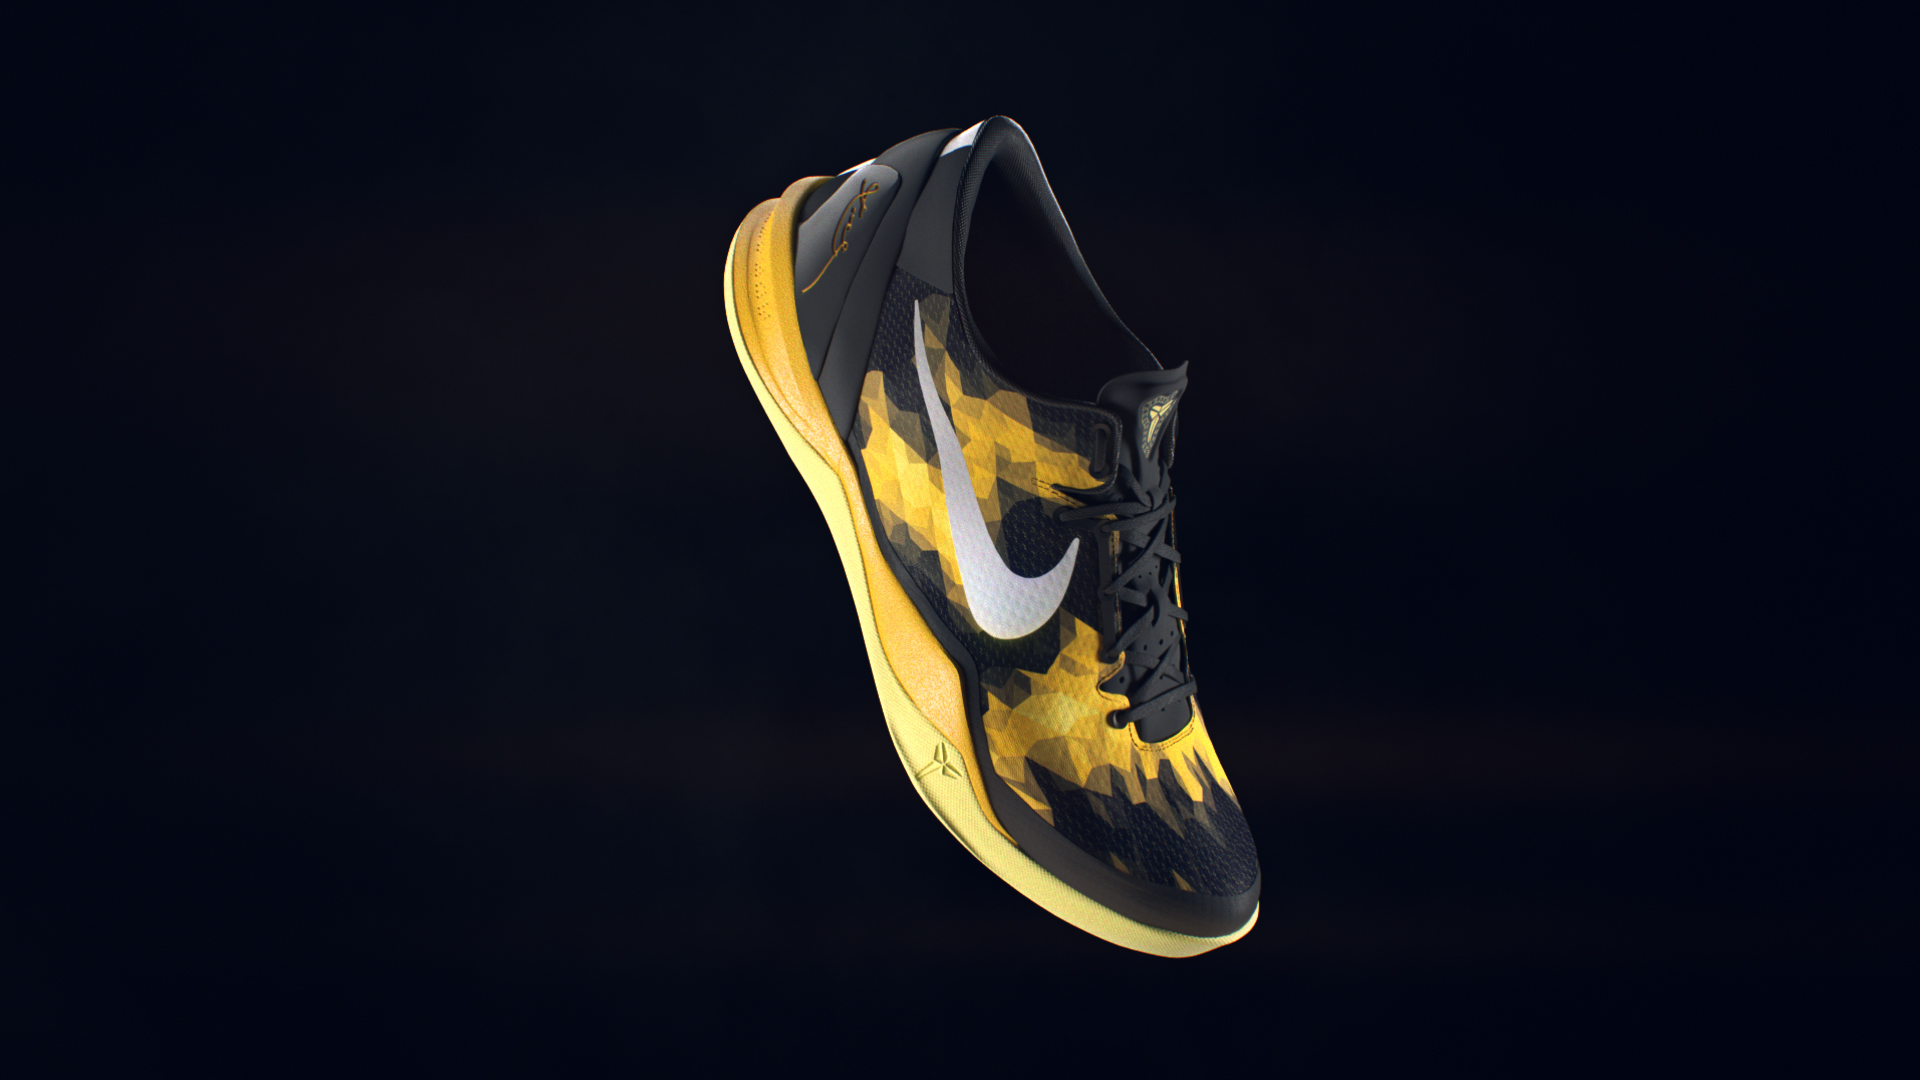 Nike_Kobe8_Directors_Cut_19_12_12 (01108).jpg